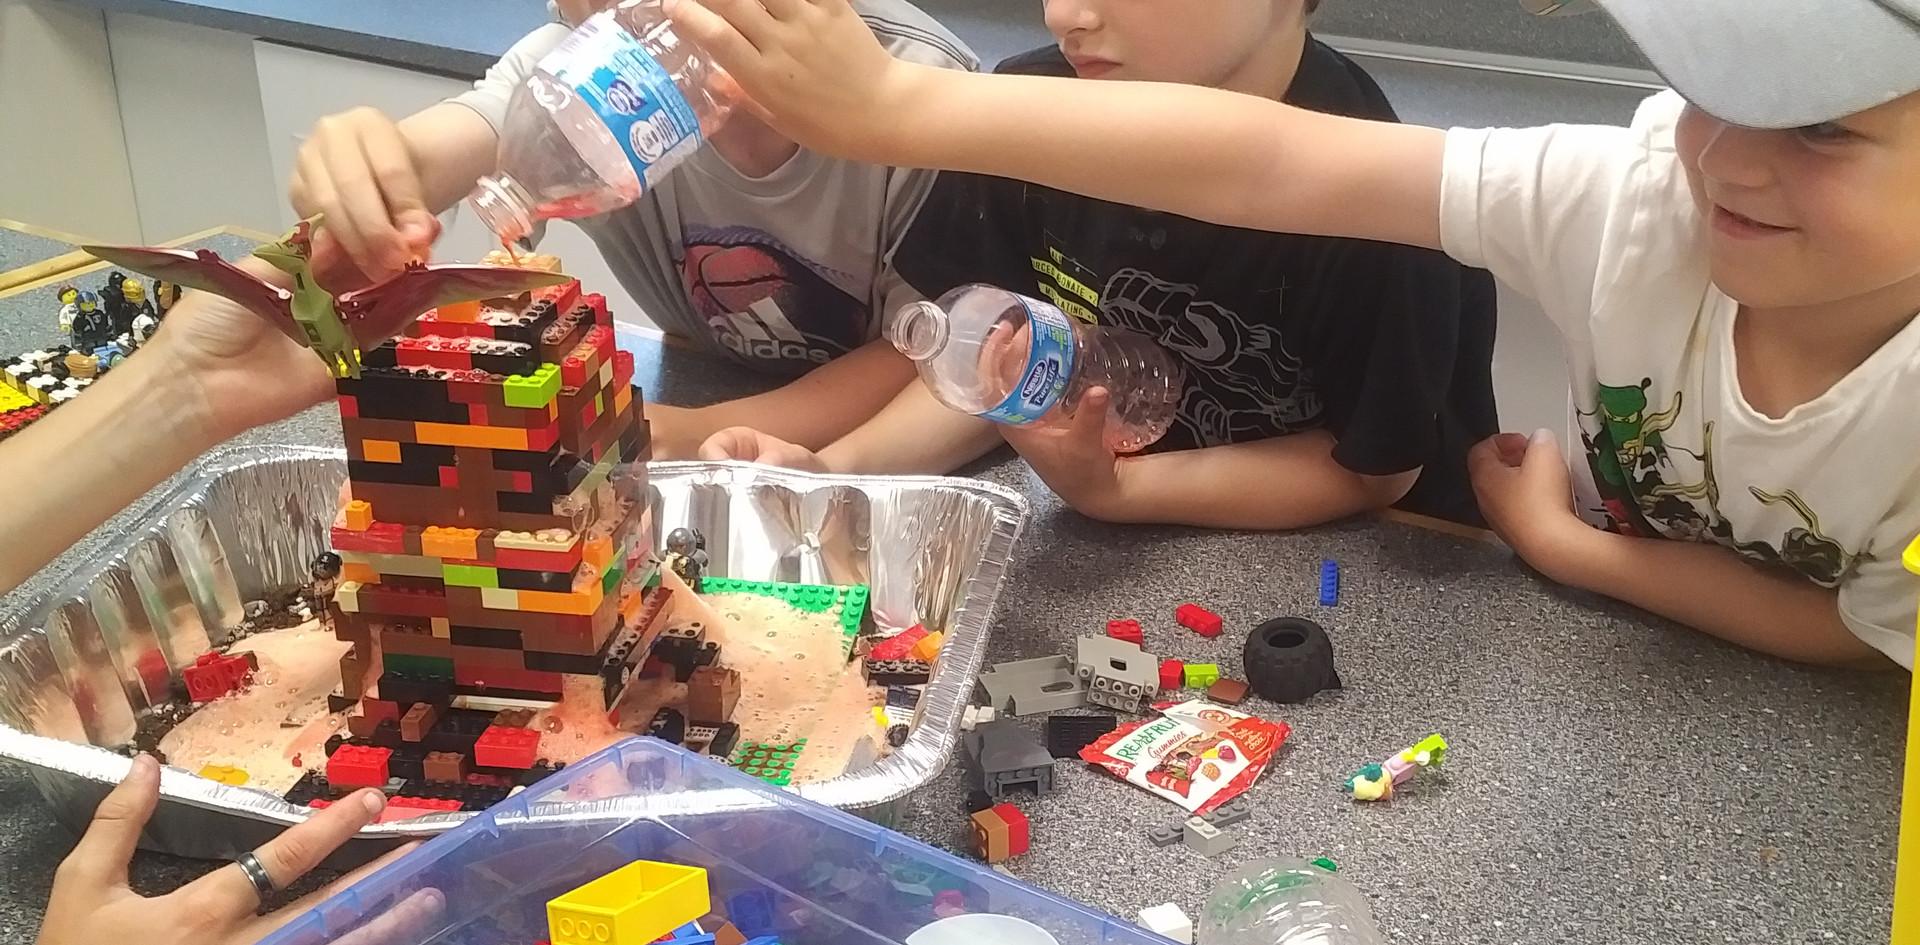 Taking turns destroying the LEGO village